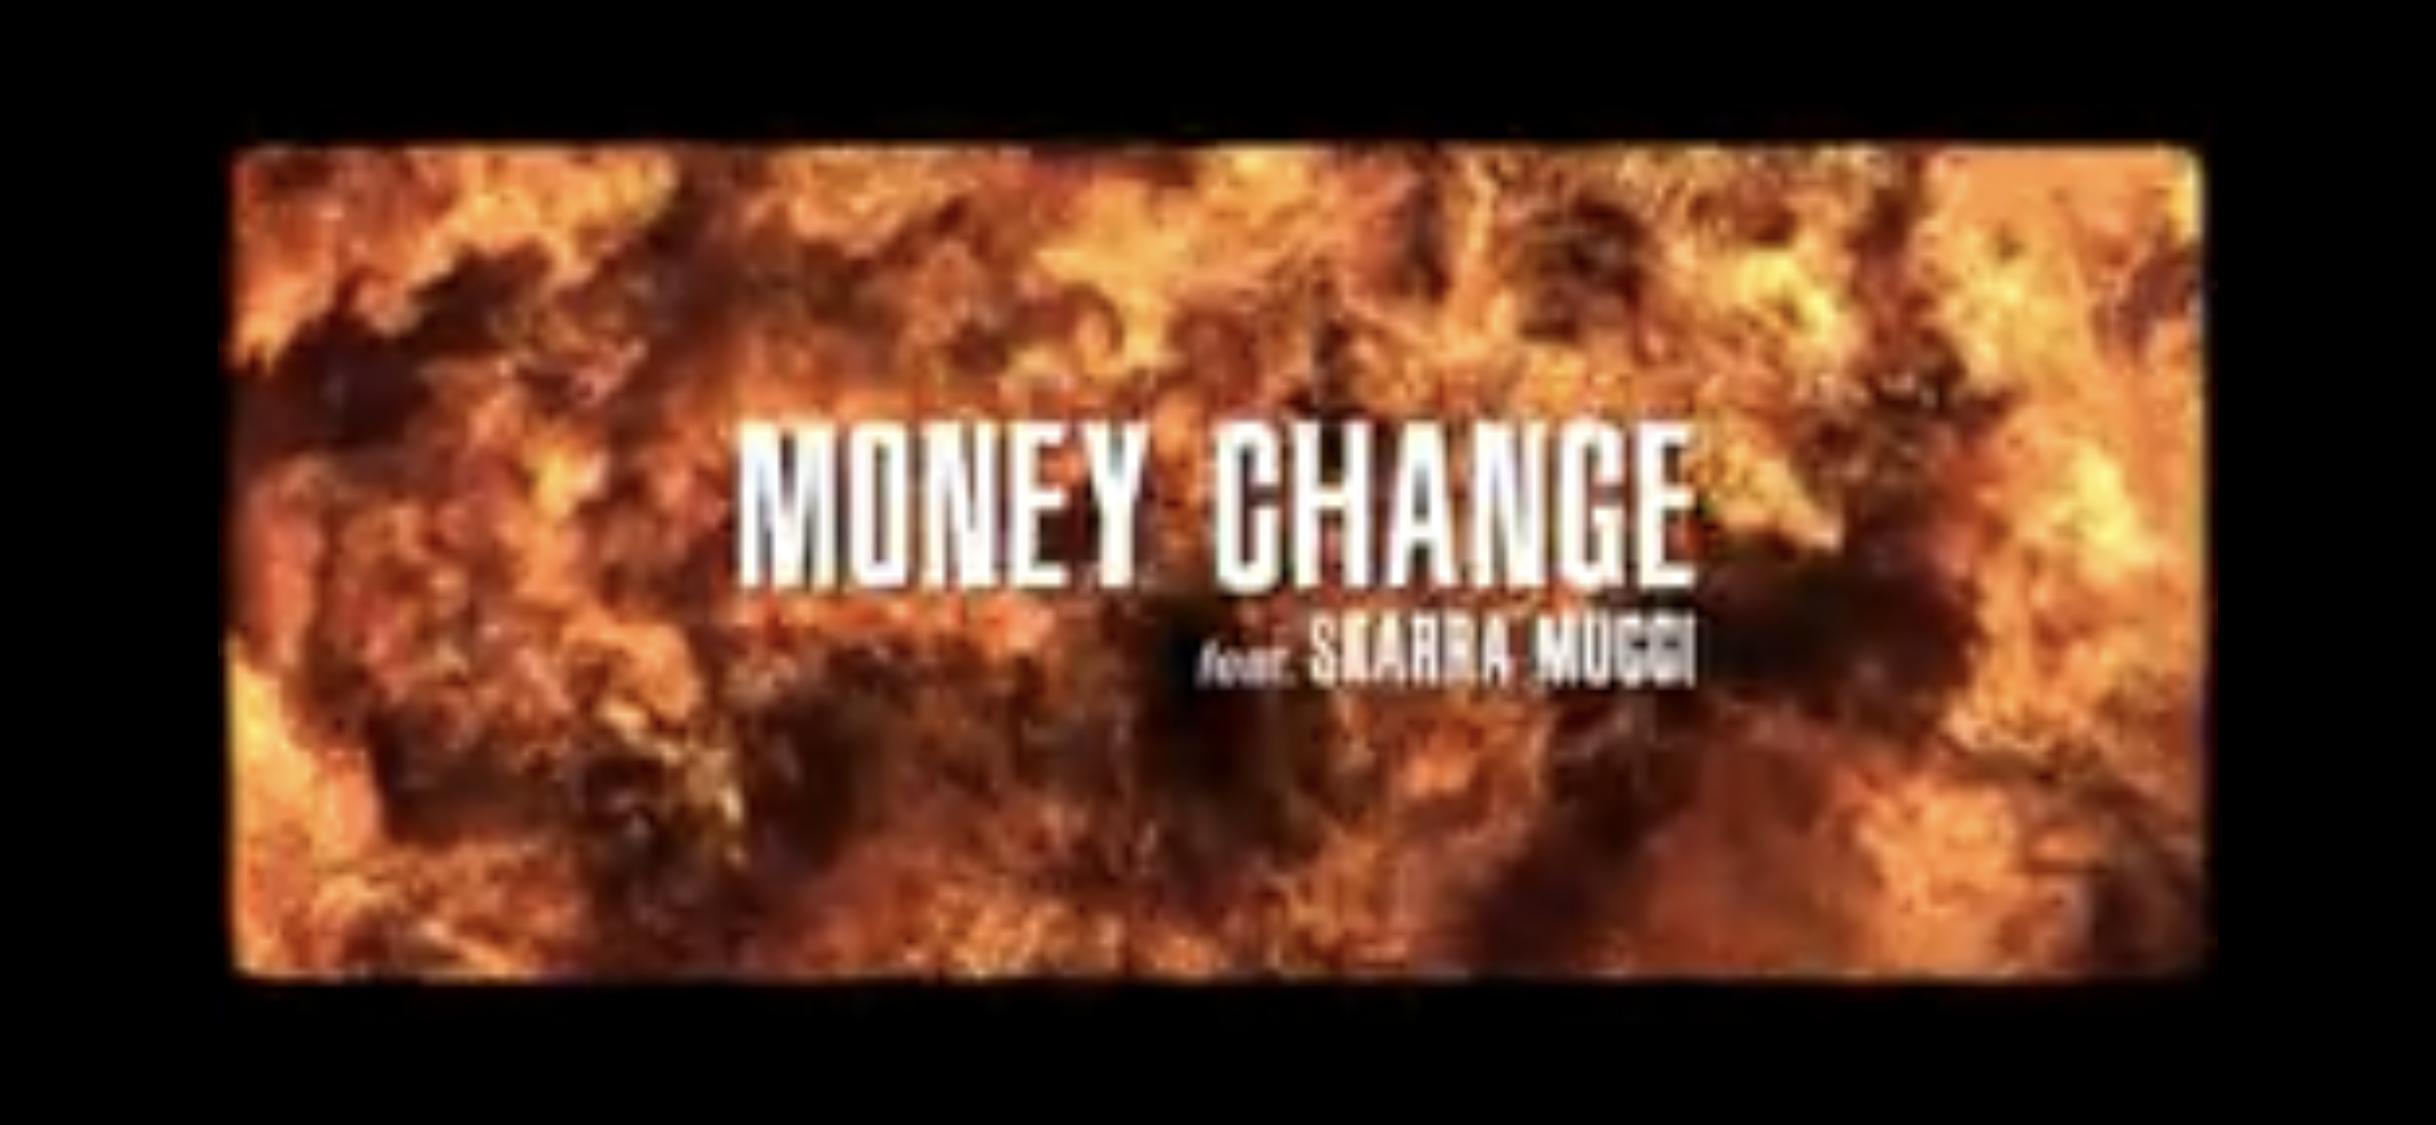 Afu-Ra - Money Change ft. Skarra Mucci (Official Video)